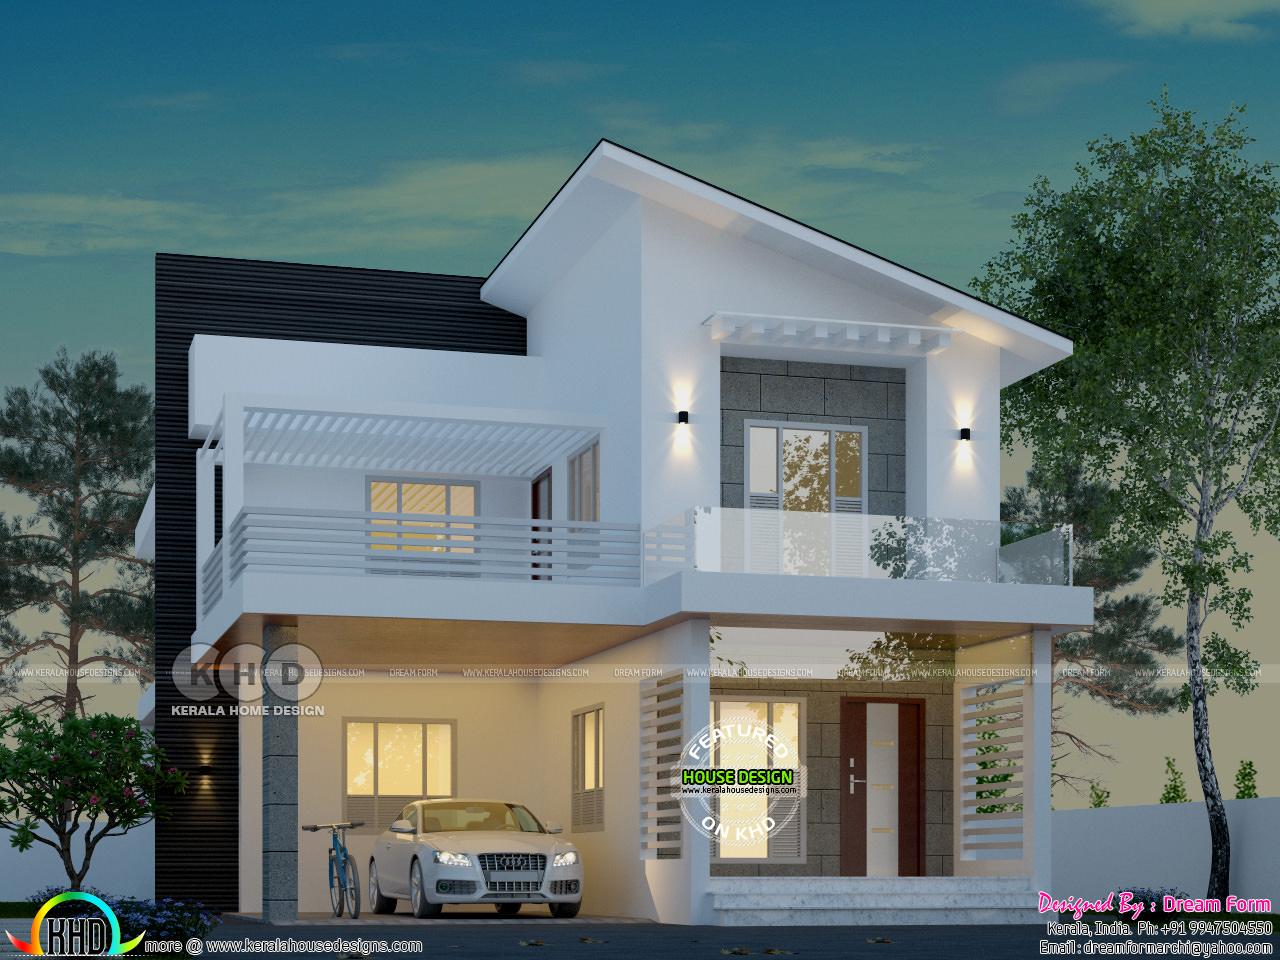 3bhk Contemporary Home Part - 27: Please Follow Kerala Home Design